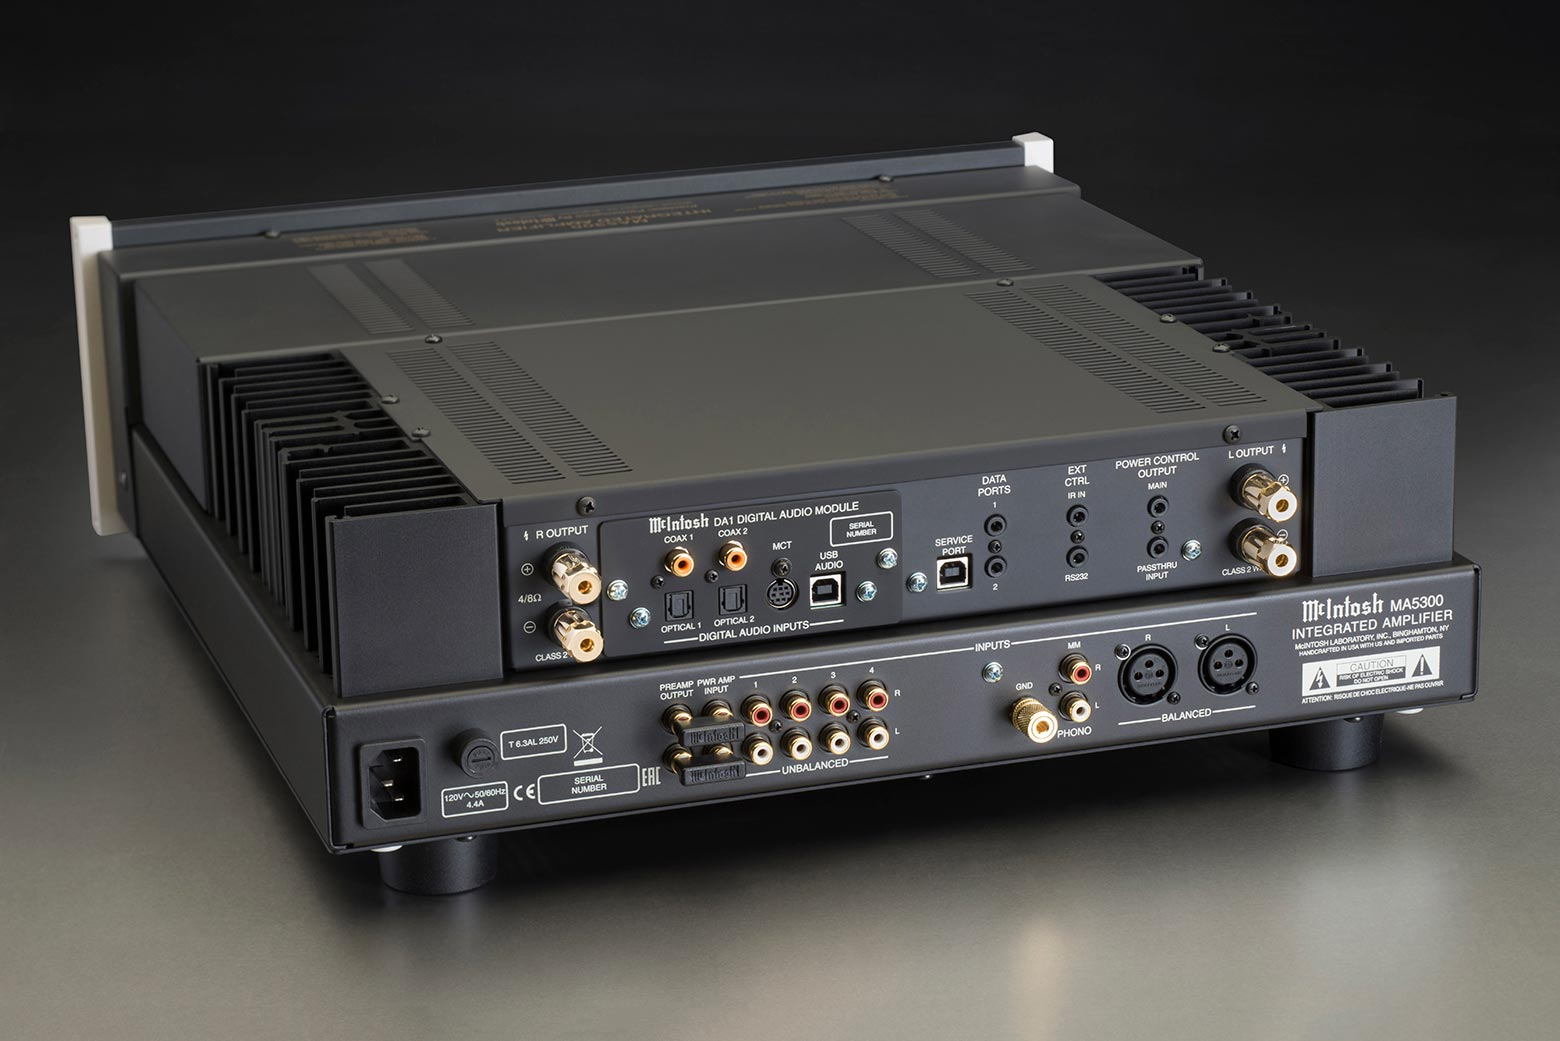 Mcintosh Ma5300 Integrated Amplifier 32 Watt Back Angle Backgroundashx